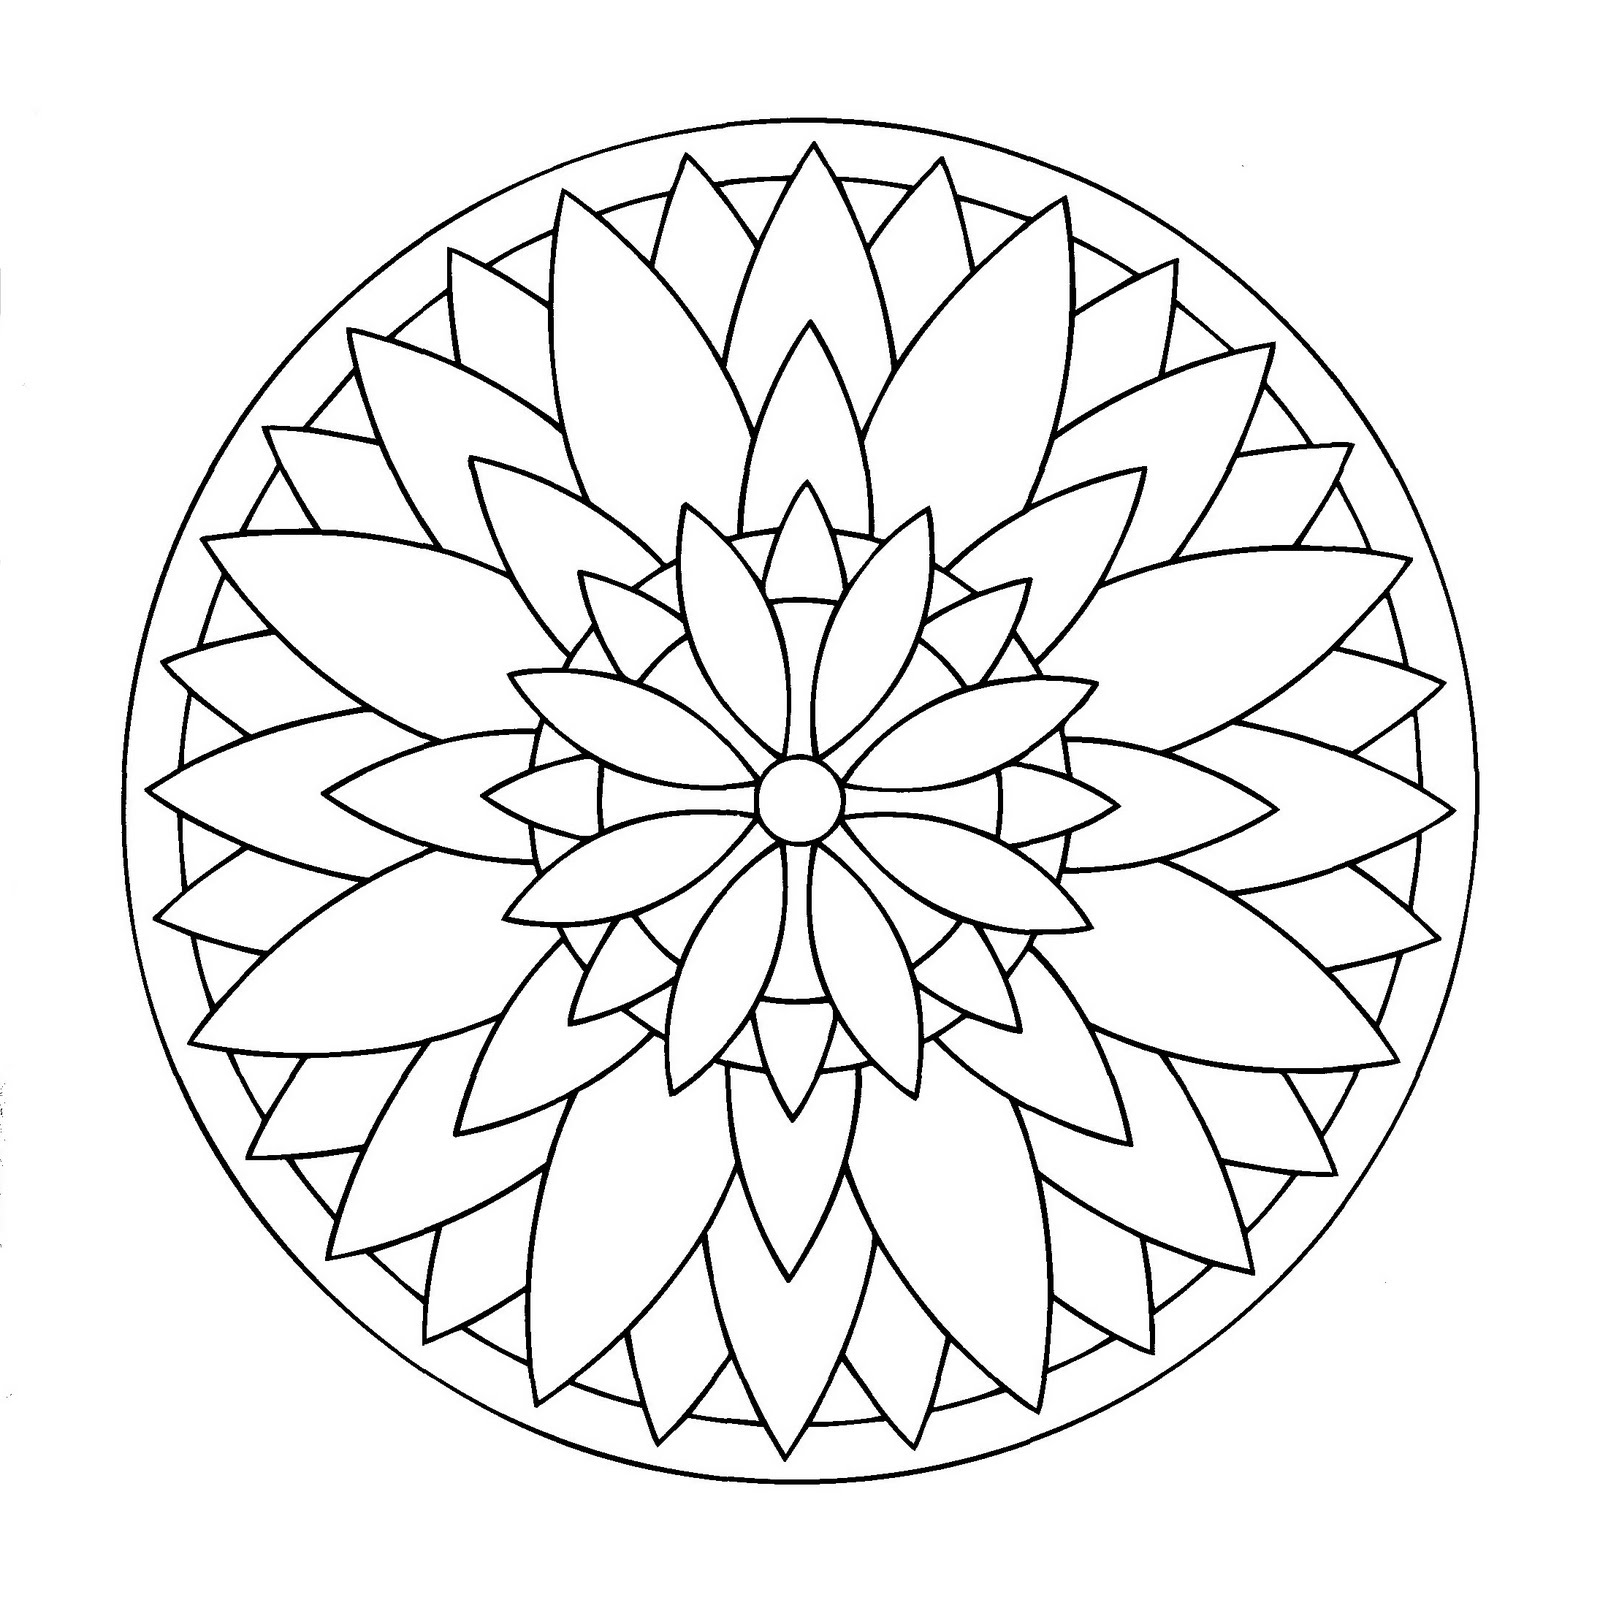 1600x1600 Mandala To Color Flowers Vegetation To Print